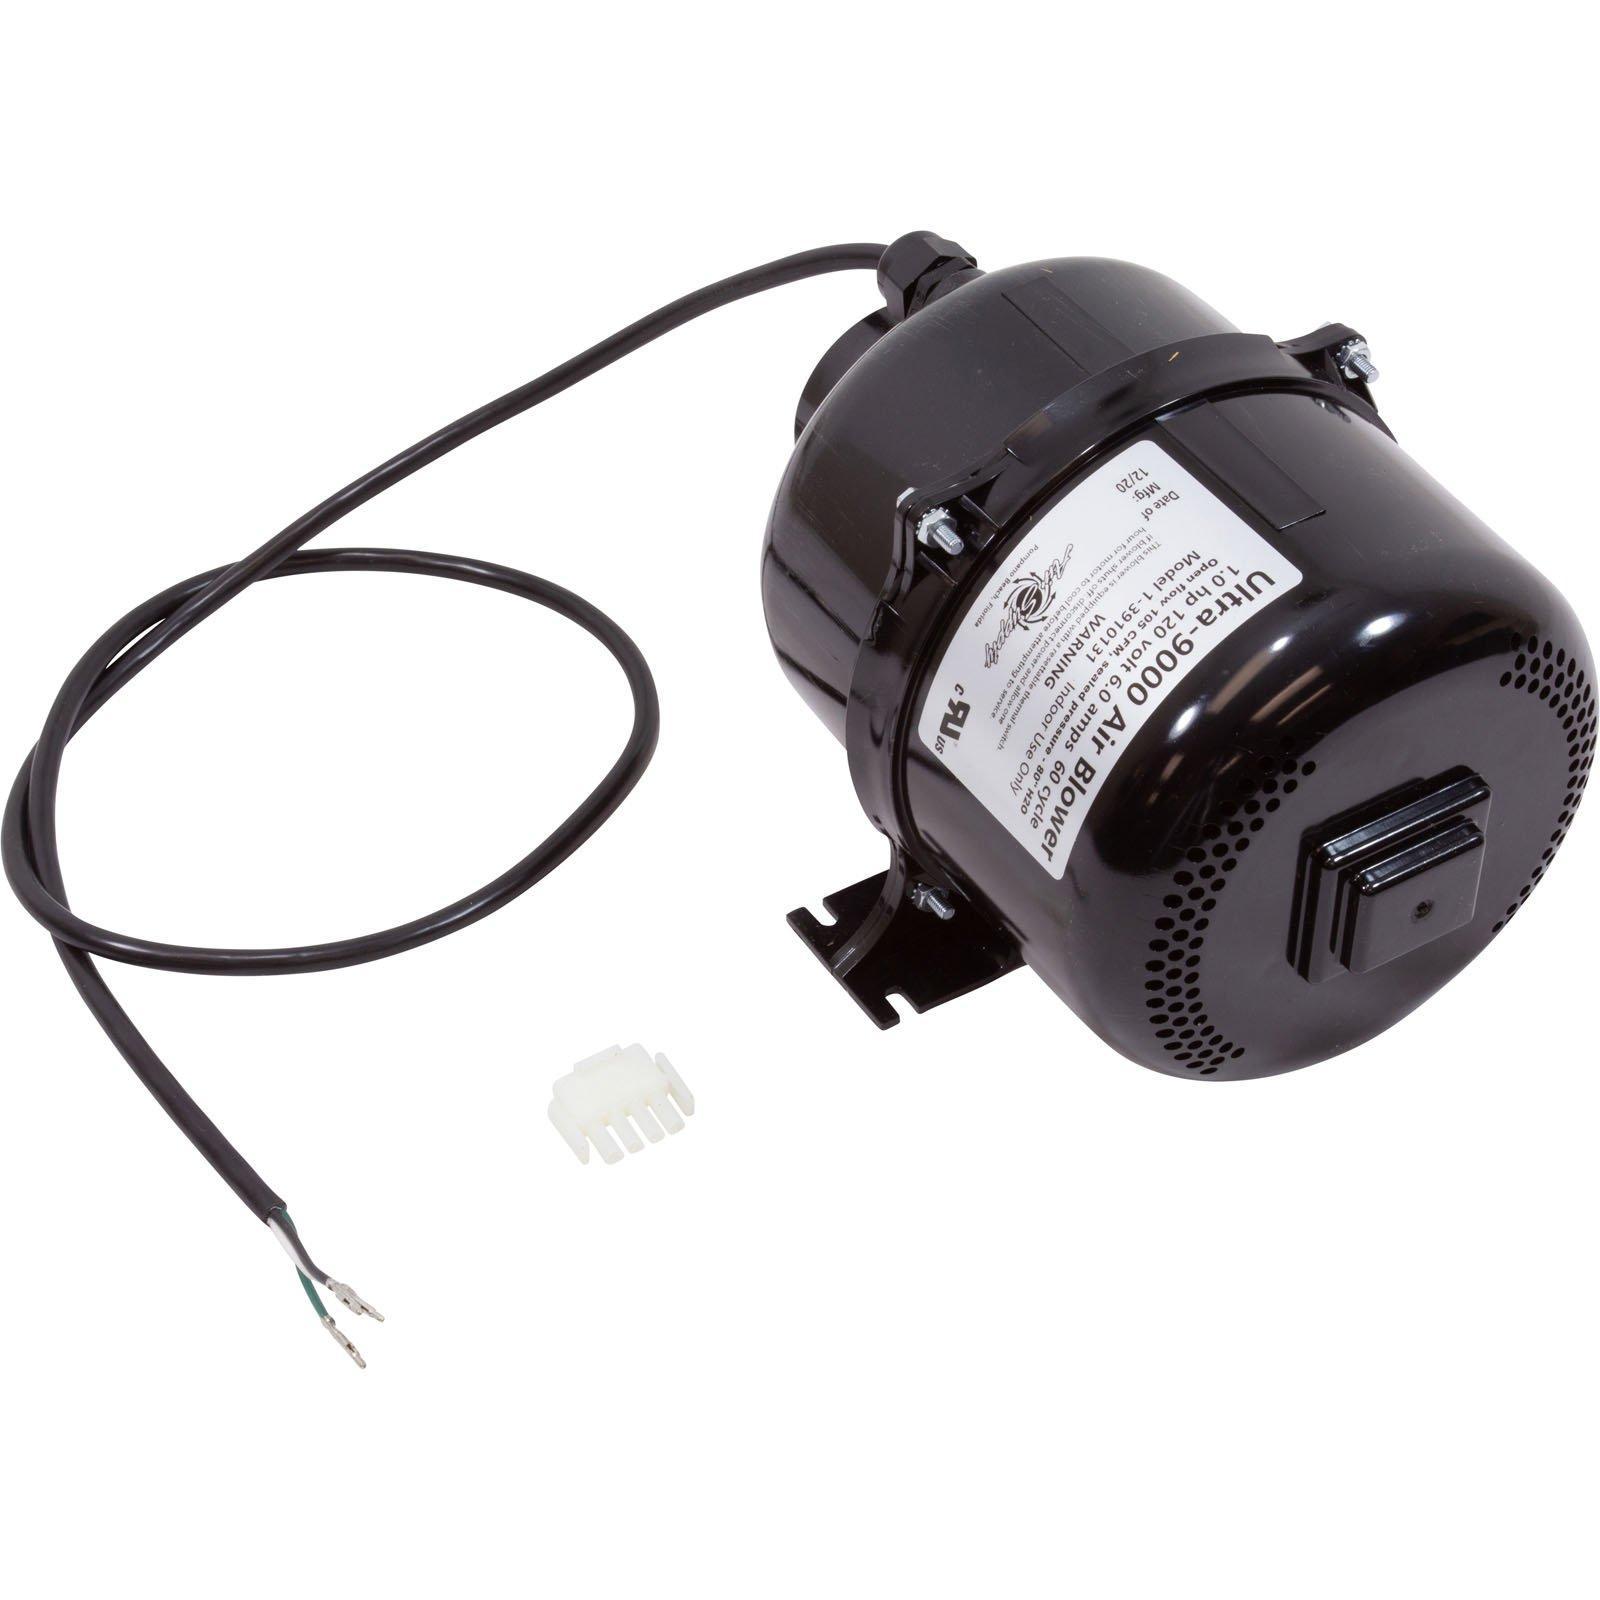 Air Supply Air Blower Ultra 9000 1HP 120V with Amp Plug